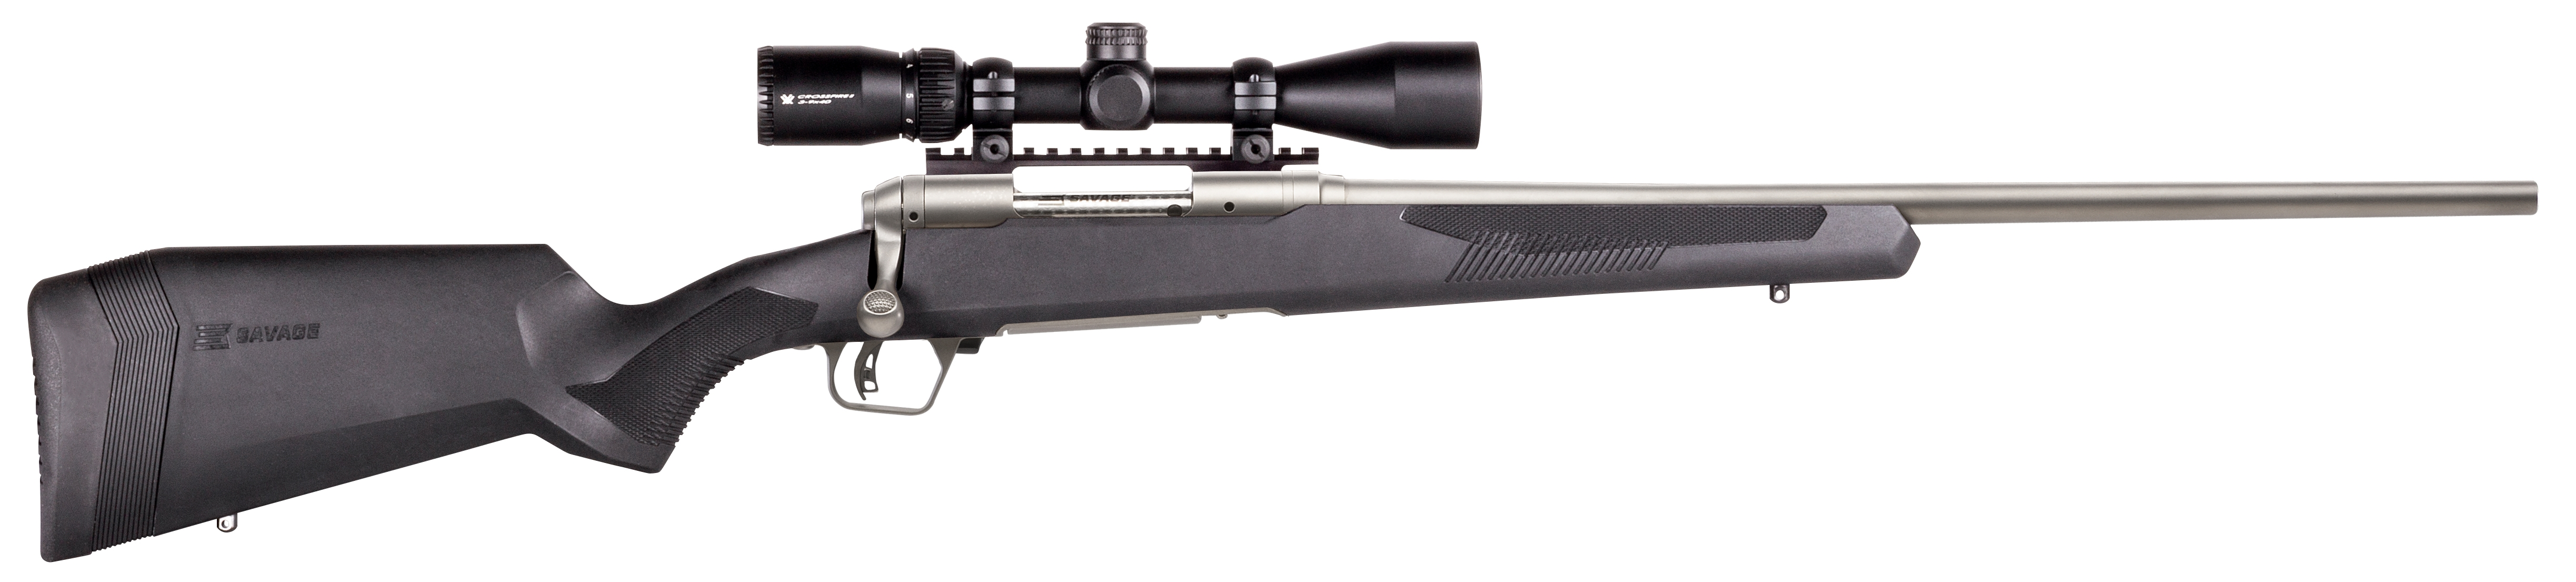 Savage Arms 110 Apex Storm XP 7mm Rem Mag